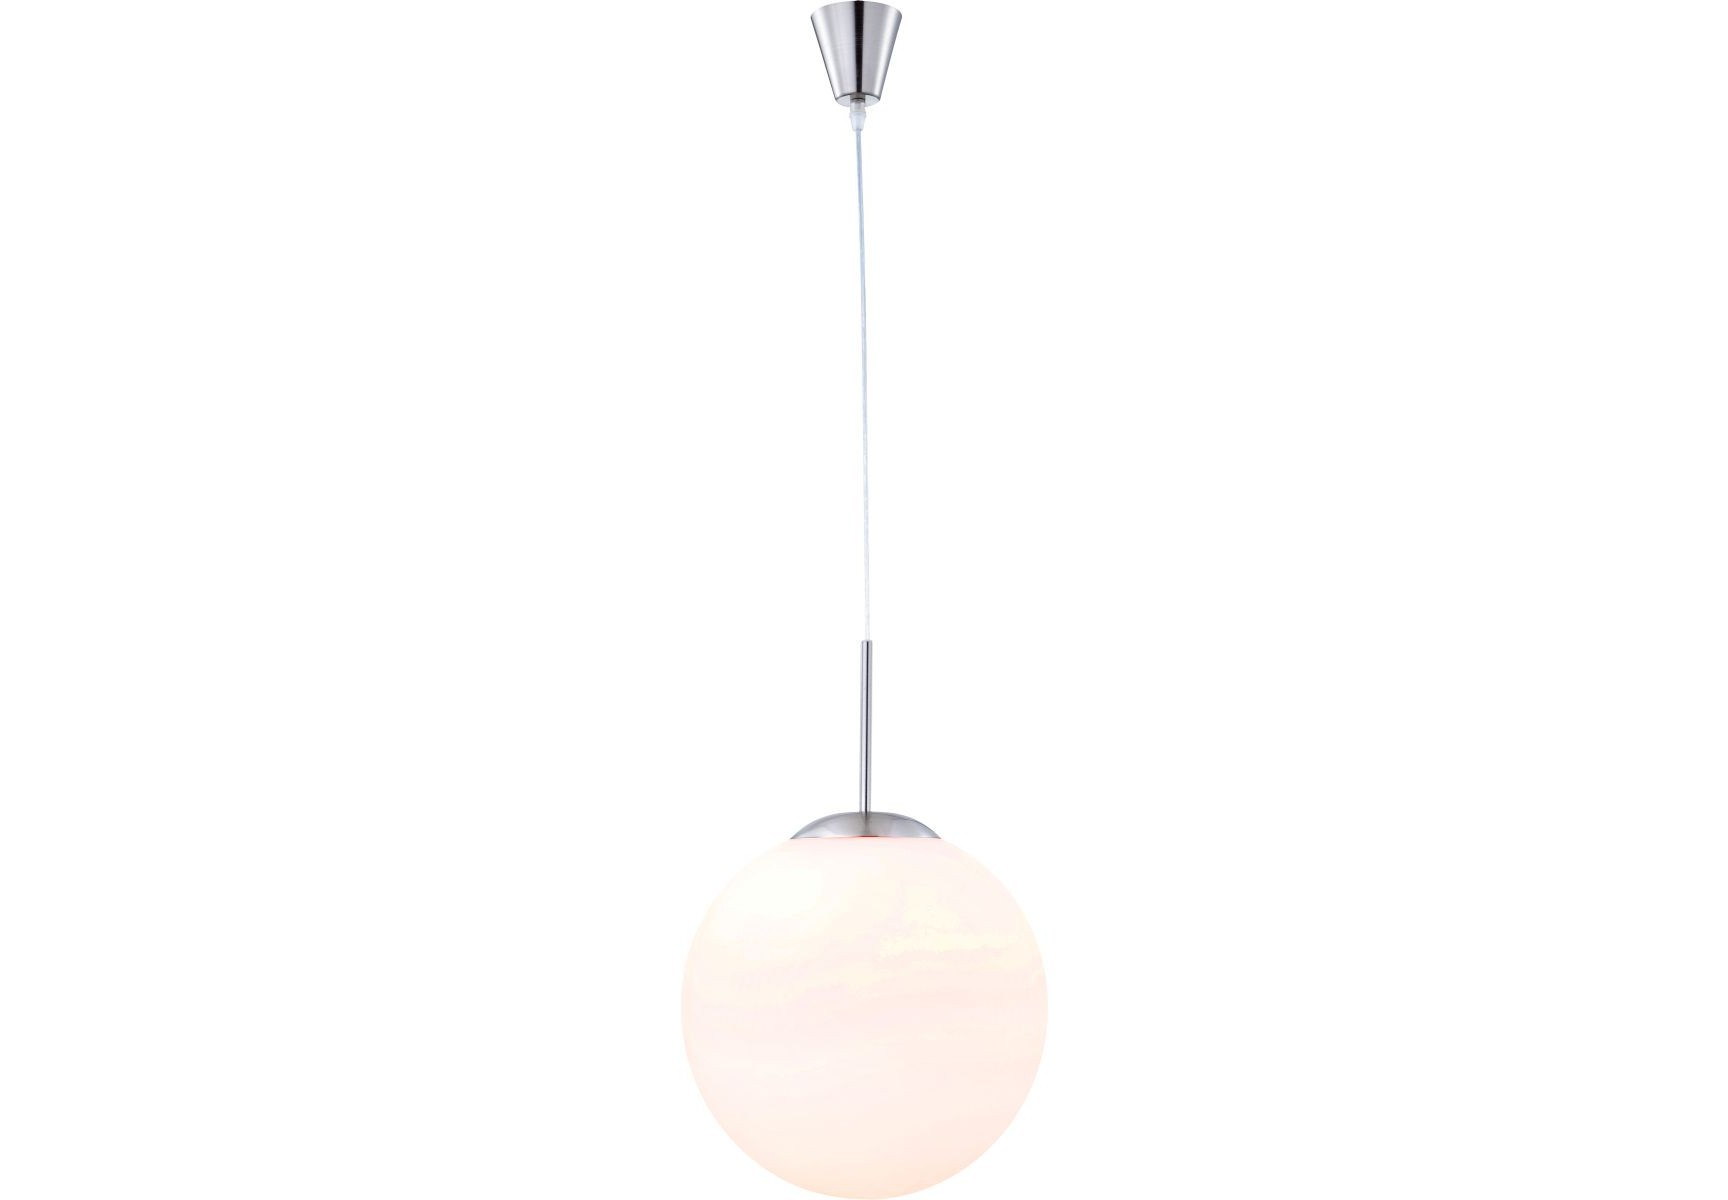 Светильник подвеснойПодвесные светильники<br>&amp;lt;div&amp;gt;Цоколь: E27&amp;lt;/div&amp;gt;&amp;lt;div&amp;gt;Мощность: 60W&amp;lt;/div&amp;gt;&amp;lt;div&amp;gt;Количество ламп: 1&amp;lt;/div&amp;gt;&amp;lt;div&amp;gt;&amp;lt;br&amp;gt;&amp;lt;/div&amp;gt;&amp;lt;div&amp;gt;&amp;lt;br&amp;gt;&amp;lt;/div&amp;gt;<br><br>Material: Стекло<br>Height см: 180<br>Diameter см: 35